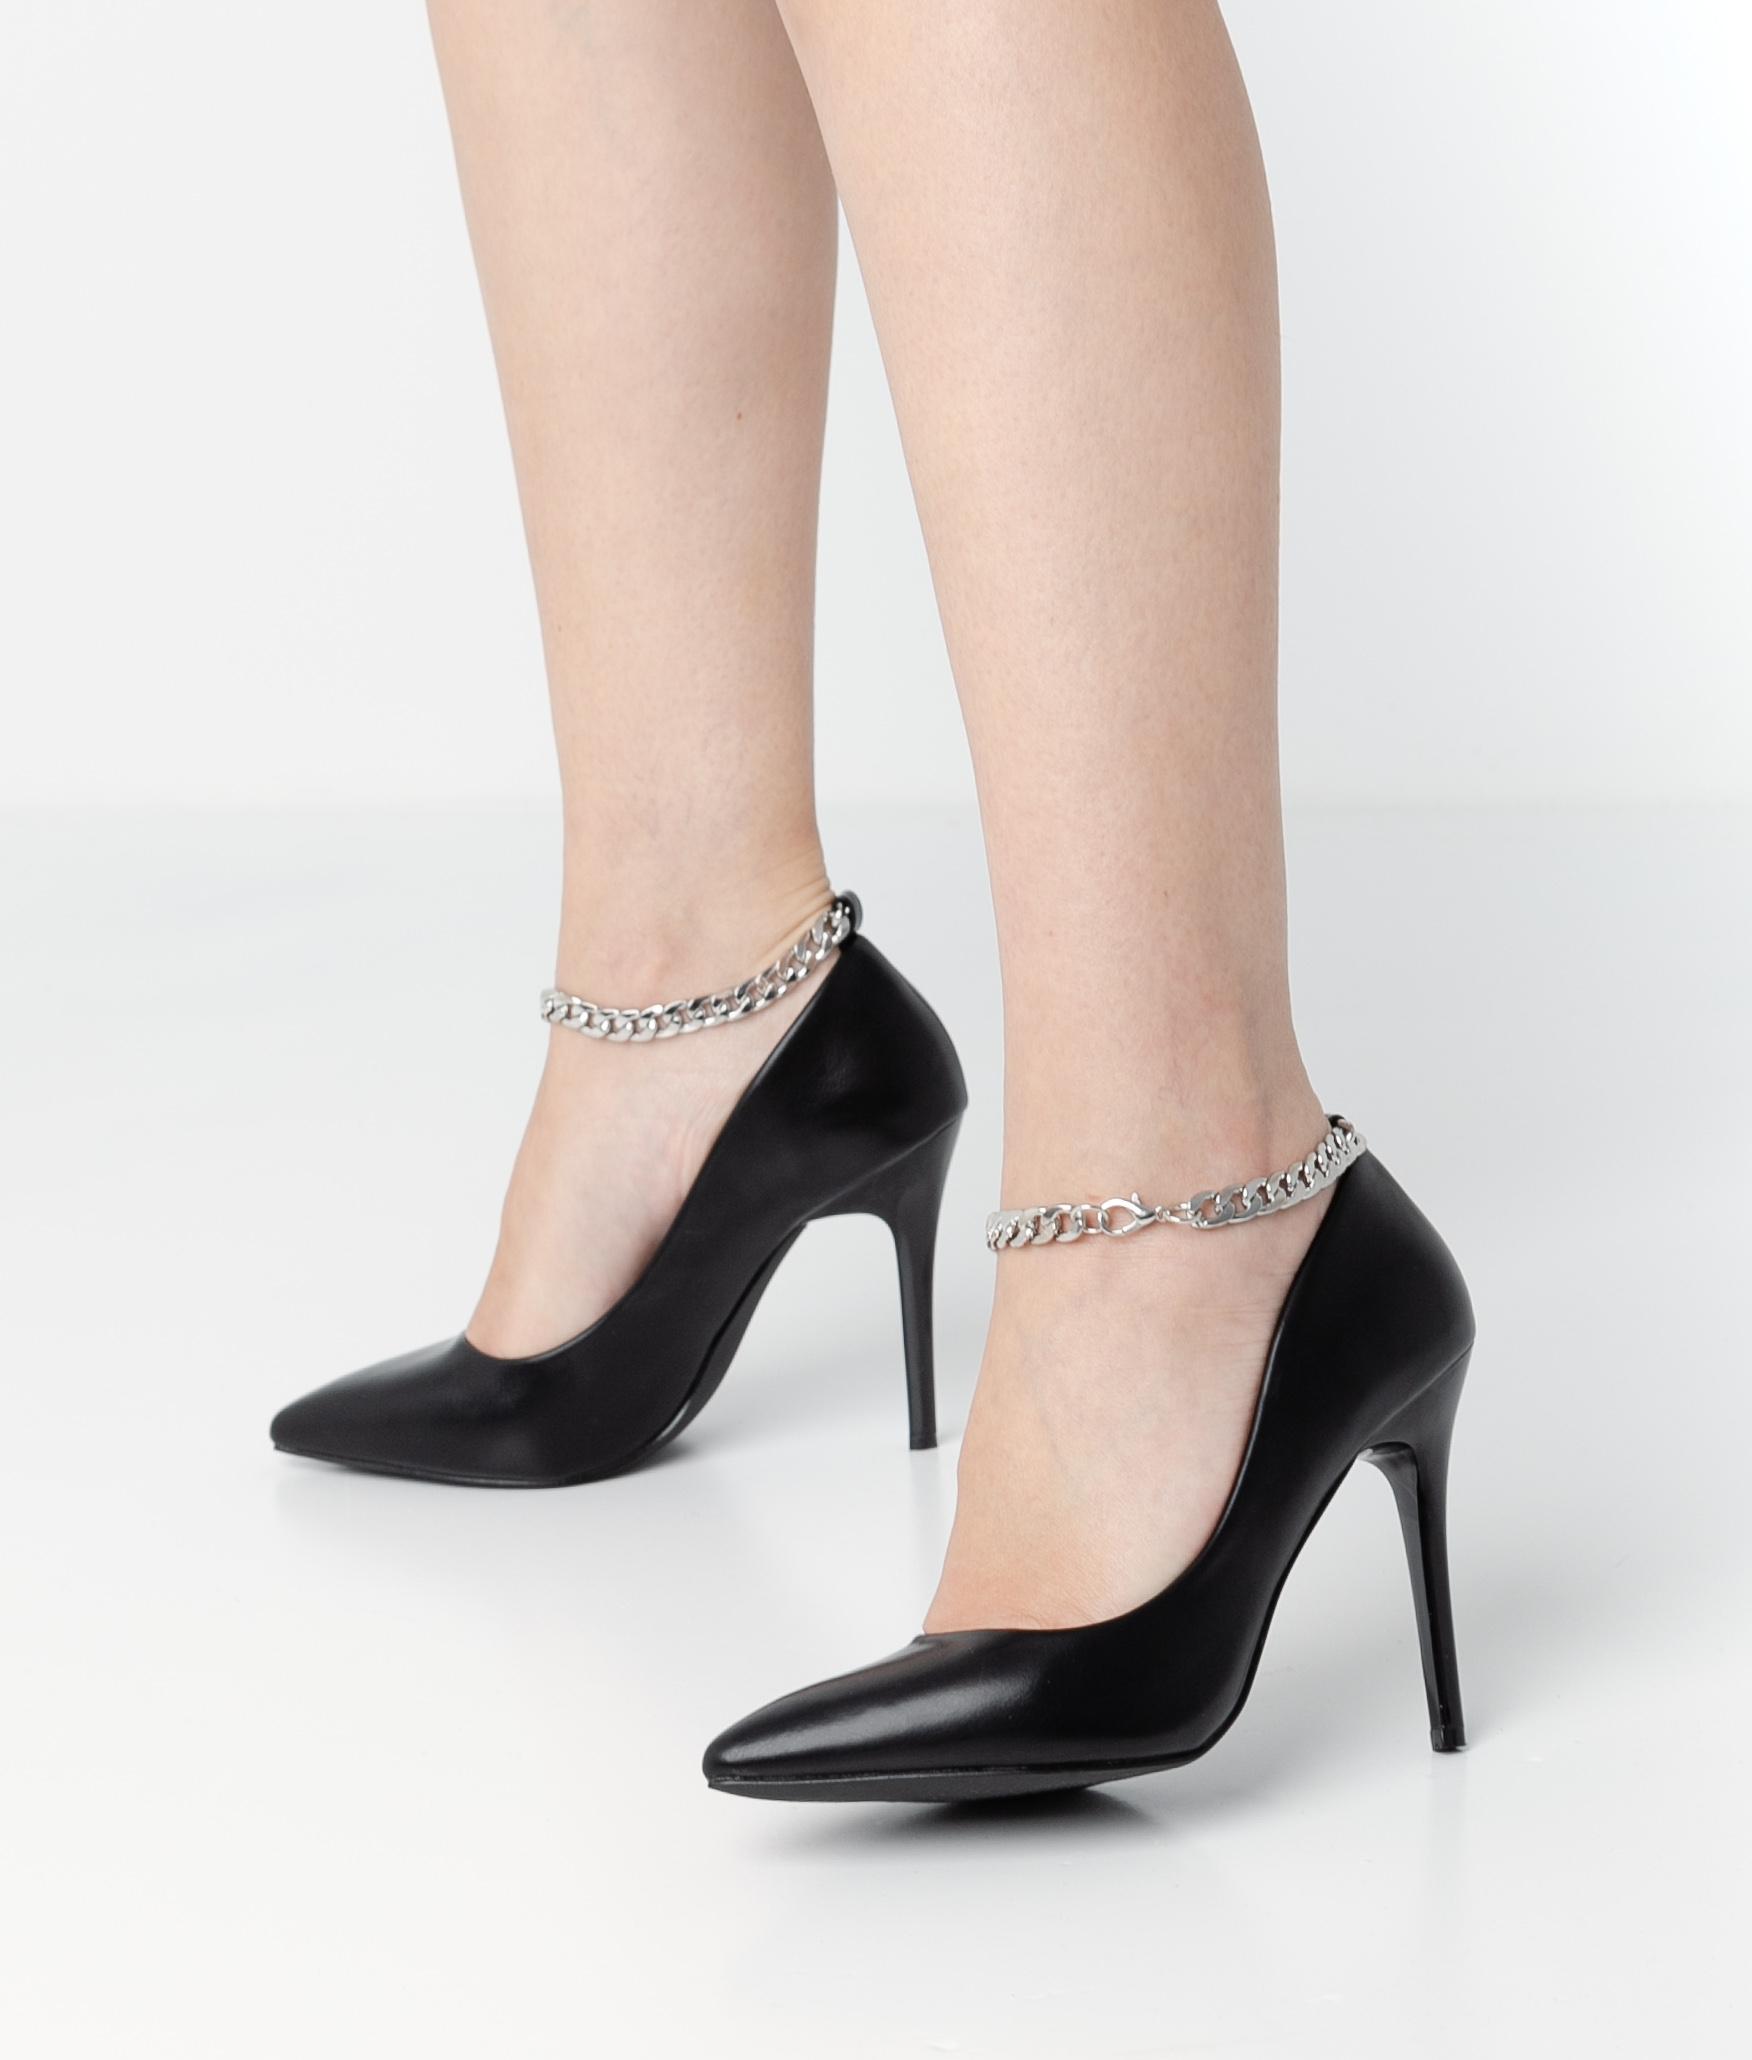 Shoe Denas - Black